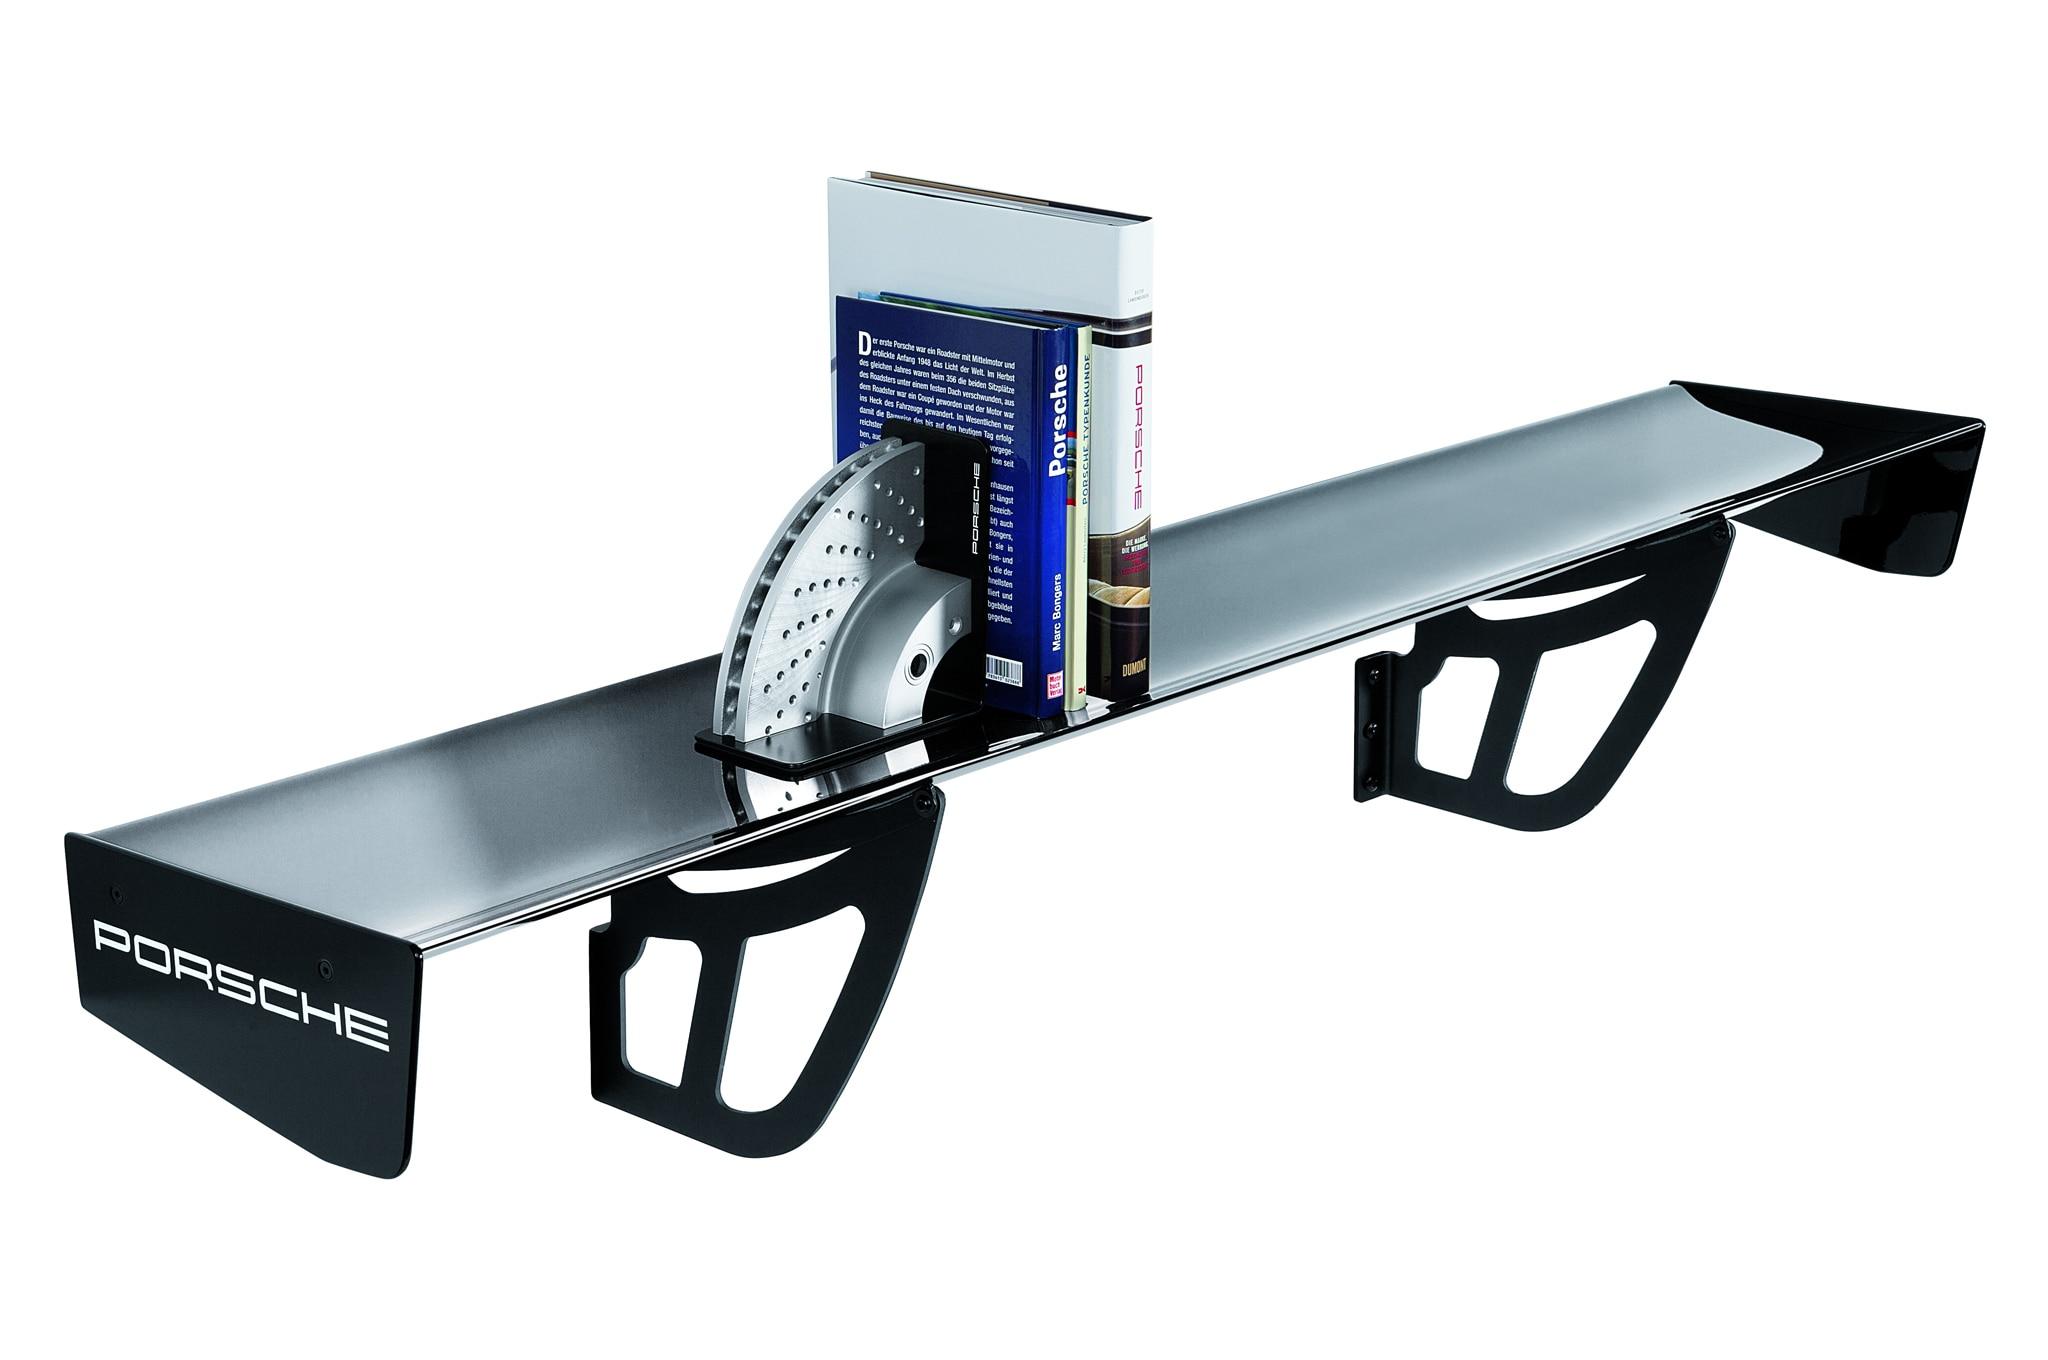 porsche 911 carrera desk chair, 911 gt3 cup shelf now on sale